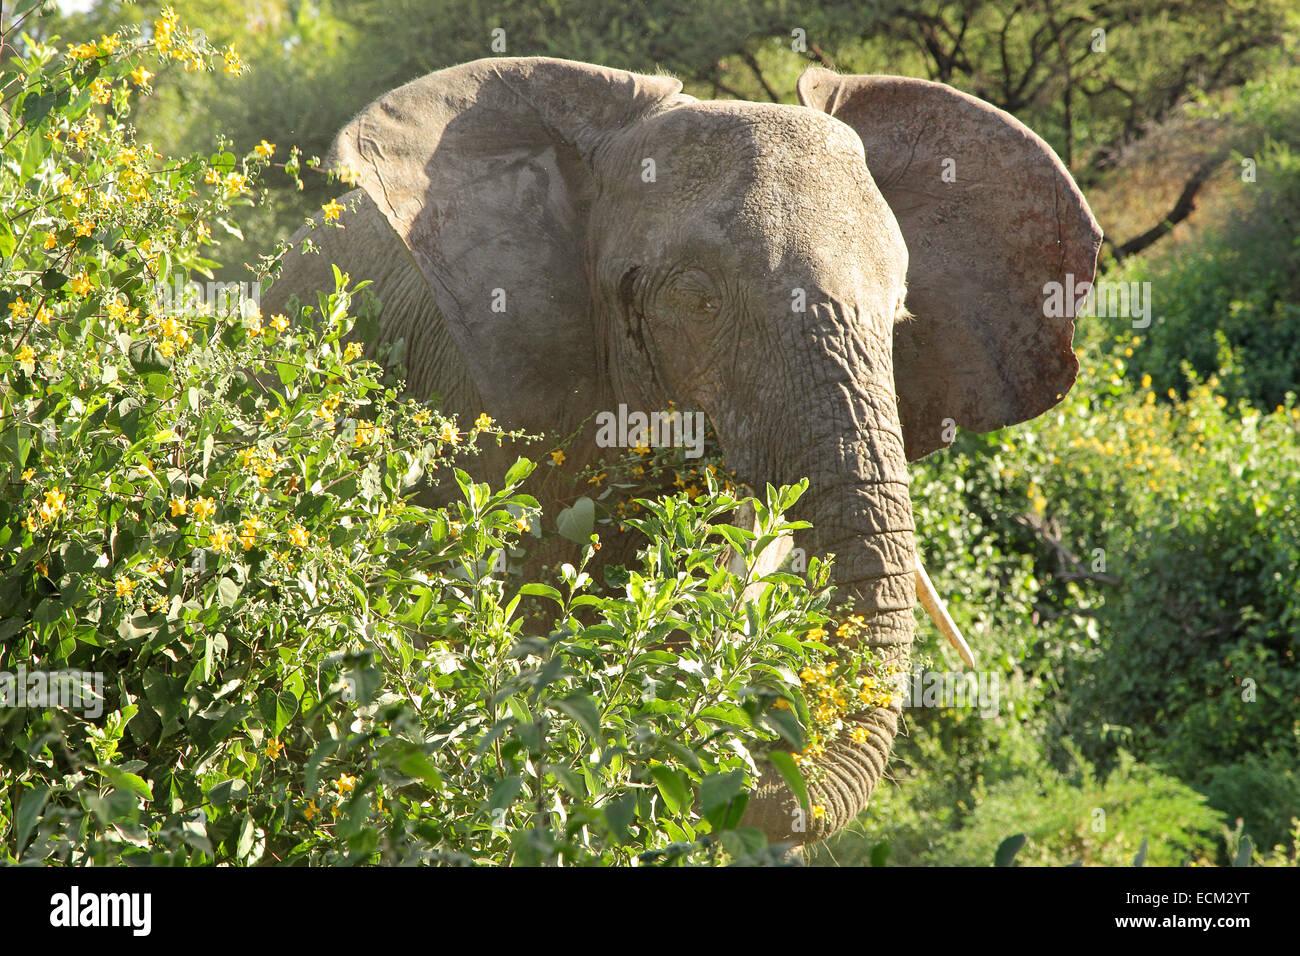 African elephant (Loxodonta Africana) eating leaves between vegetation, Lake Manyara National Park, Tanzania - Stock Image